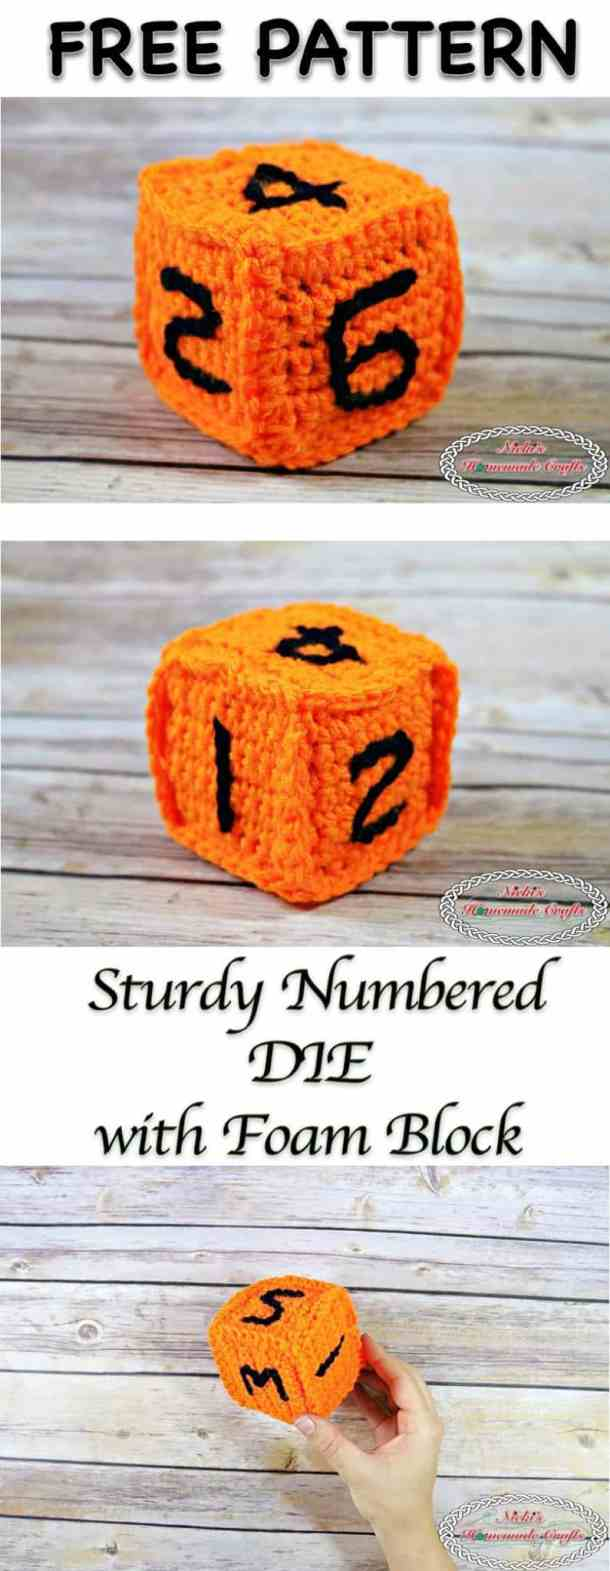 Sturdy Numbered Die with Foam Block - Free Crochet Pattern - Nicki's